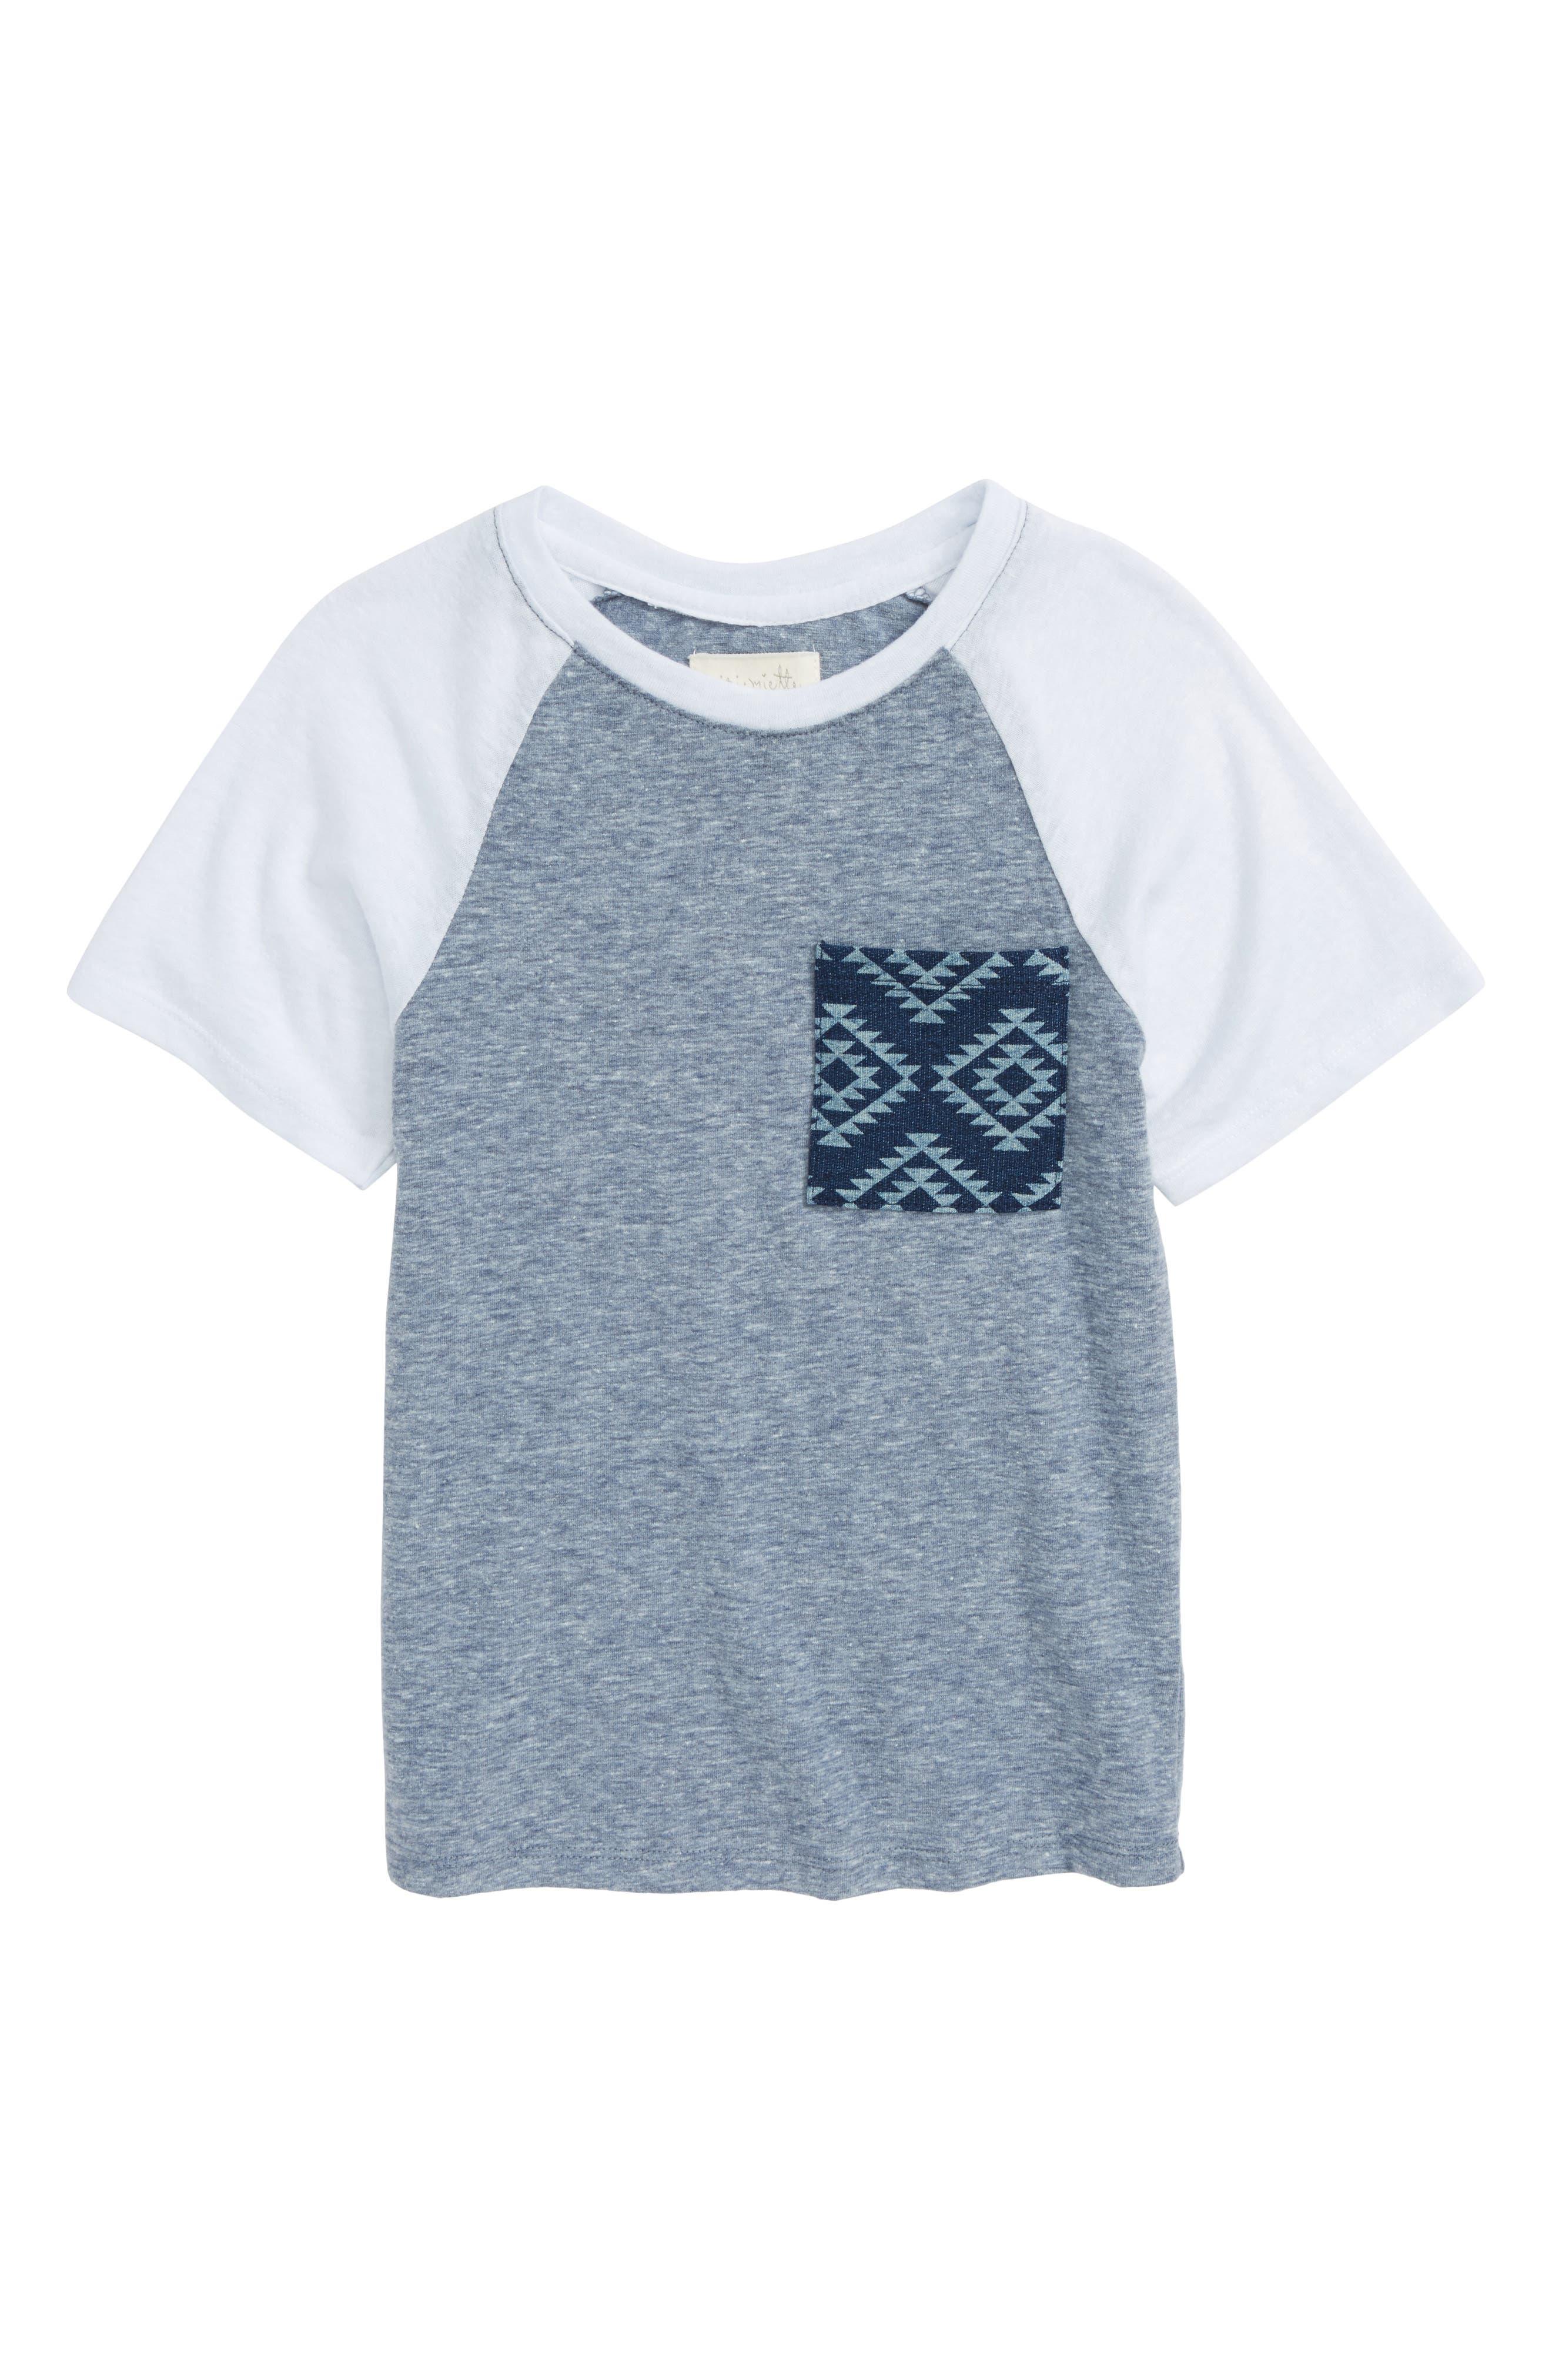 Main Image - Miki Miette Sydney Pocket T-Shirt (Toddler Boys, Little Boys & Big Boys)